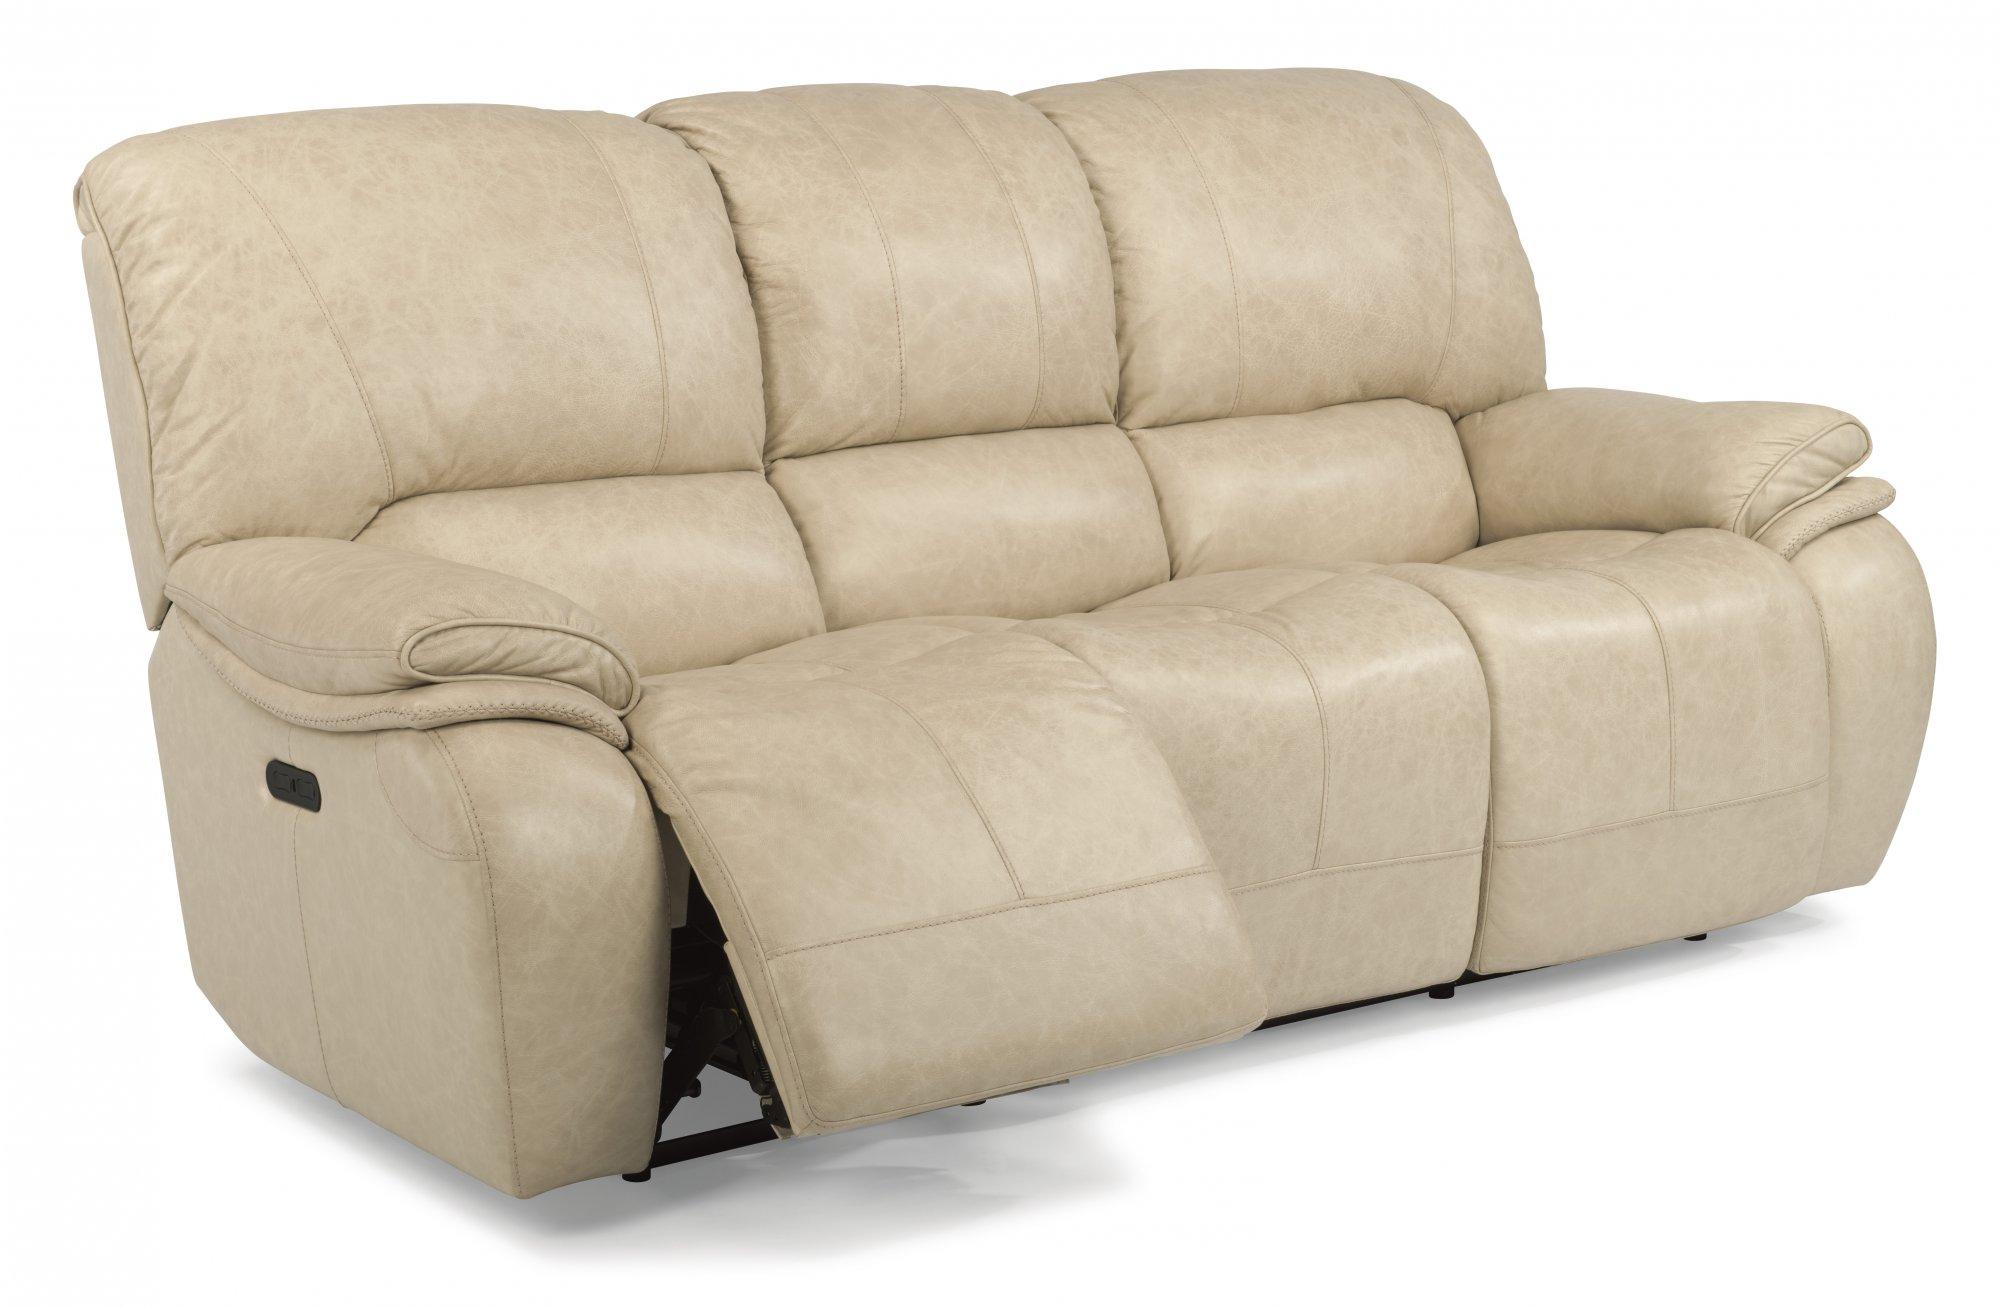 Flexsteel 1515 62ph Tobin Leather Power Reclining Sofa